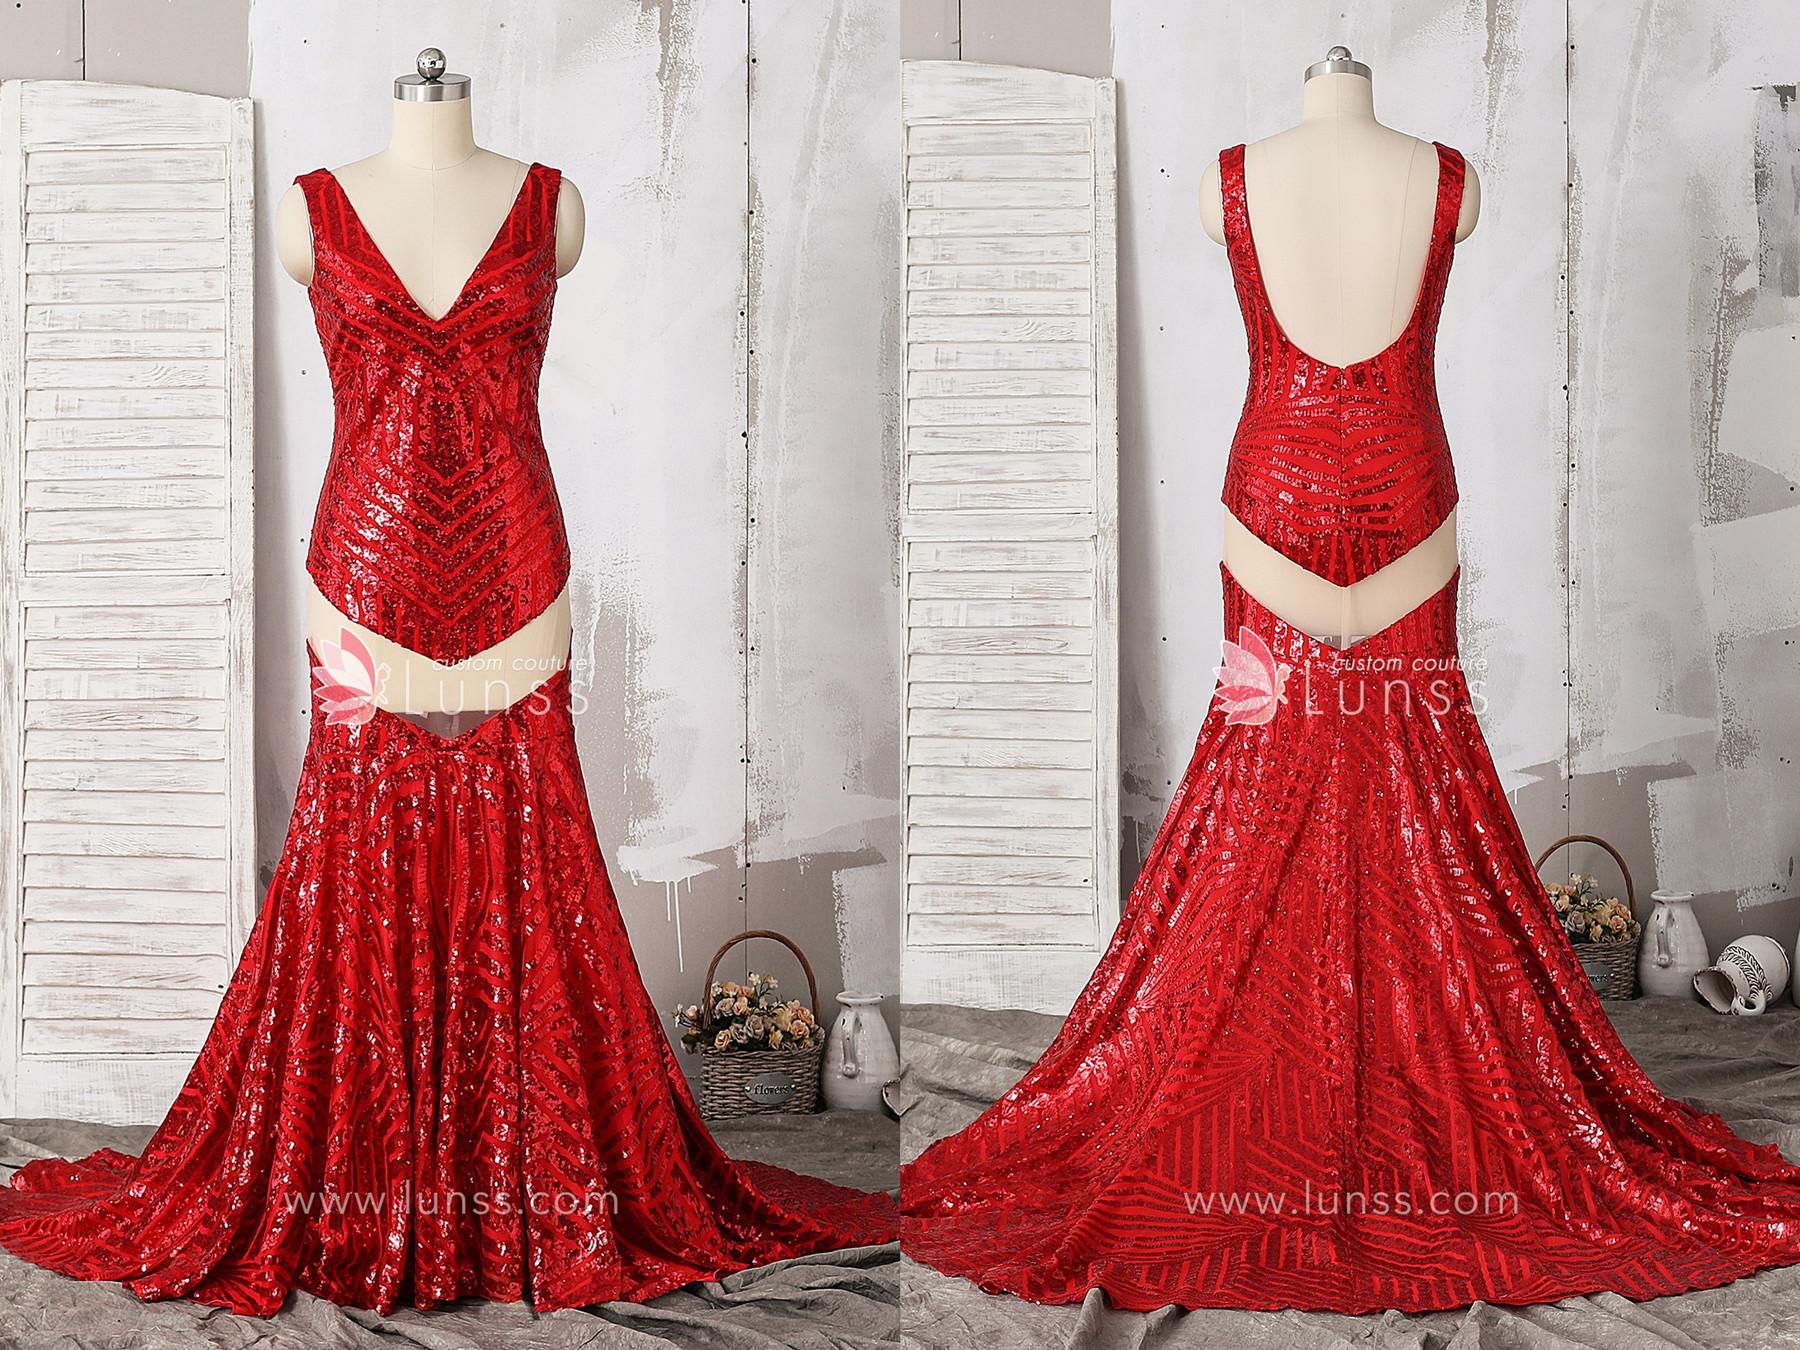 4eea277f78d3 Red-Joint-Mesh-Bombshell-Pattern-Sequin-Mermaid-Prom-. 2. Rose Gold Halter  Neckline Mermaid Prom Dress